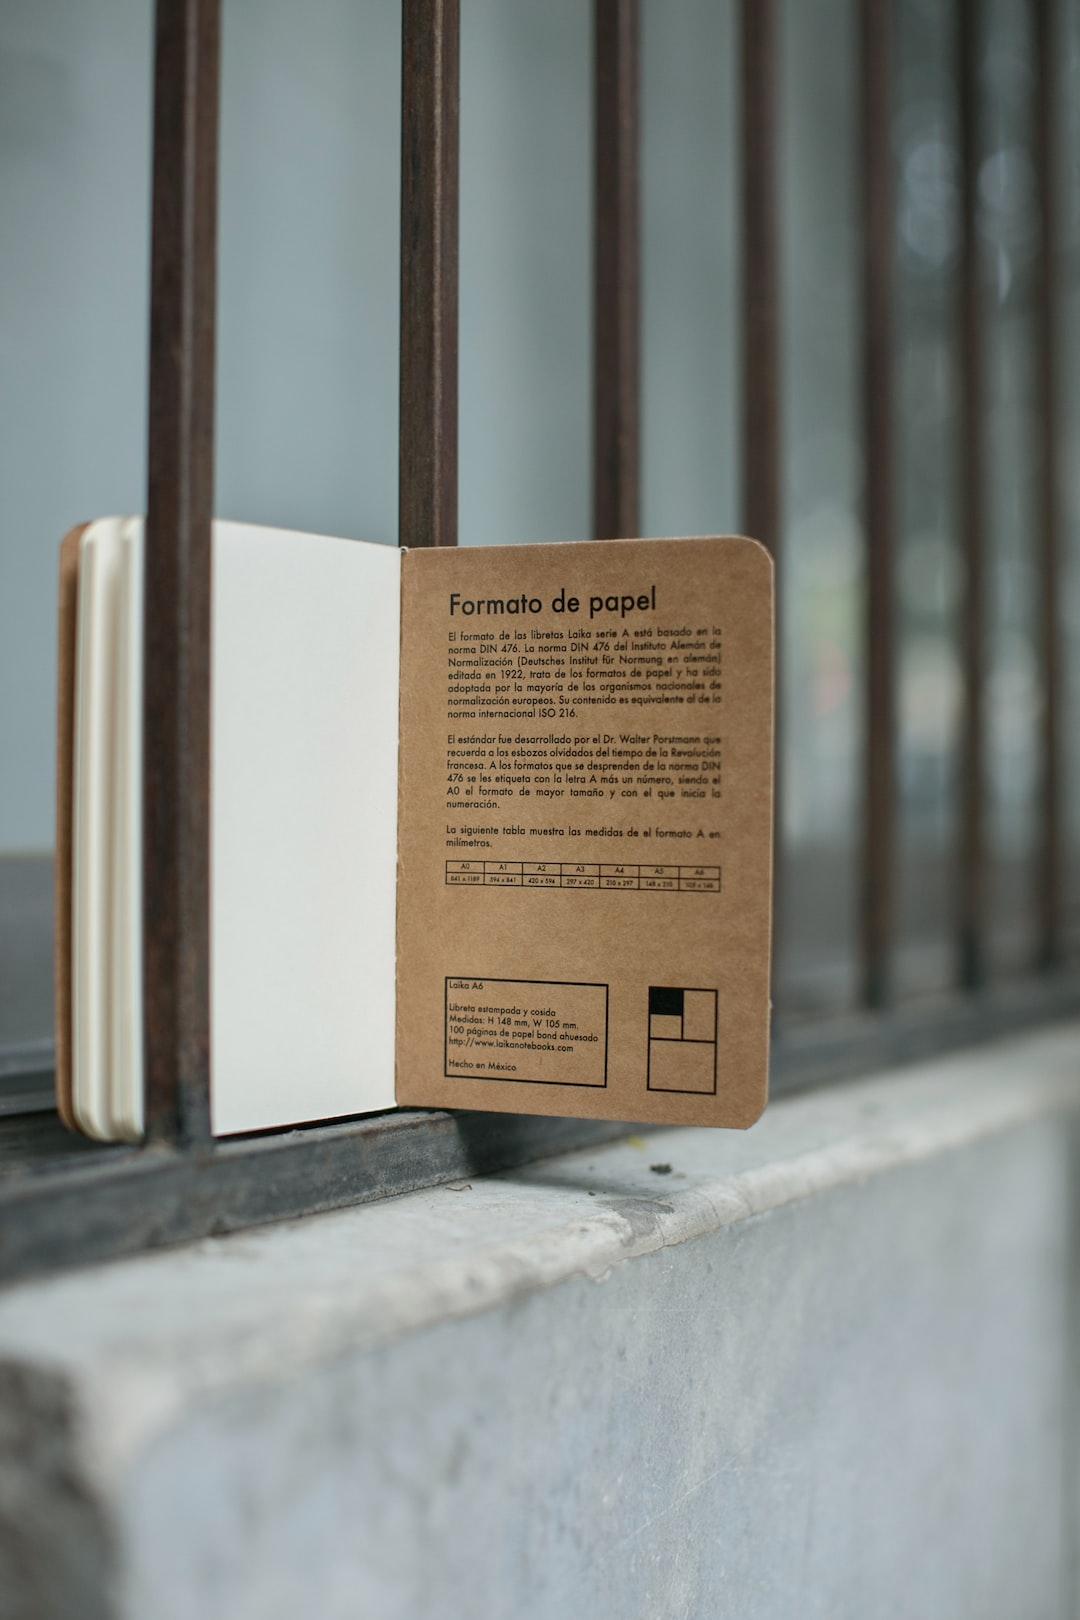 opened brown book on metal window grill photo free image on unsplash